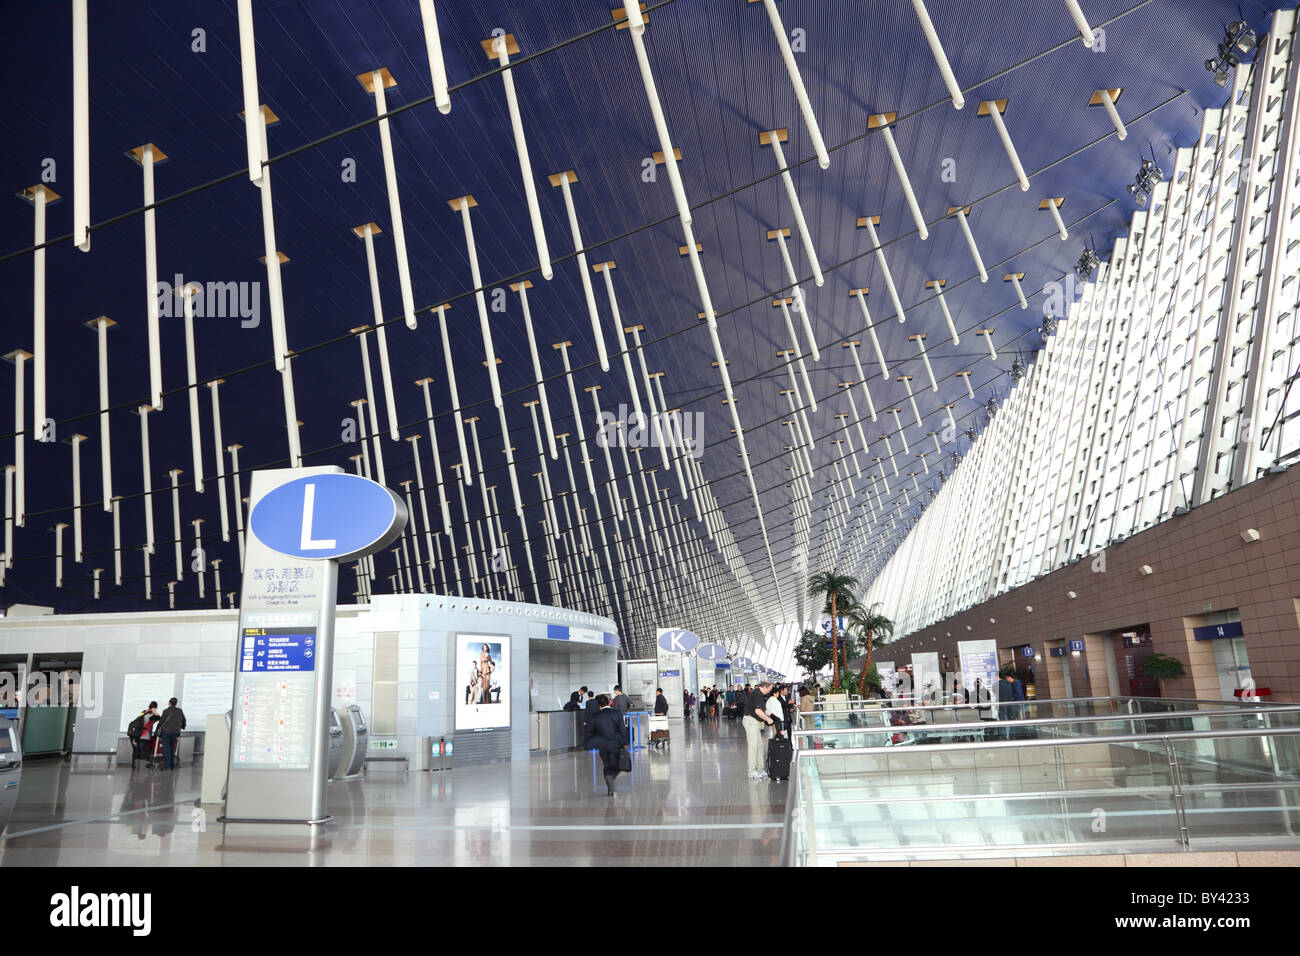 Shanghai International Airport. - Stock Image